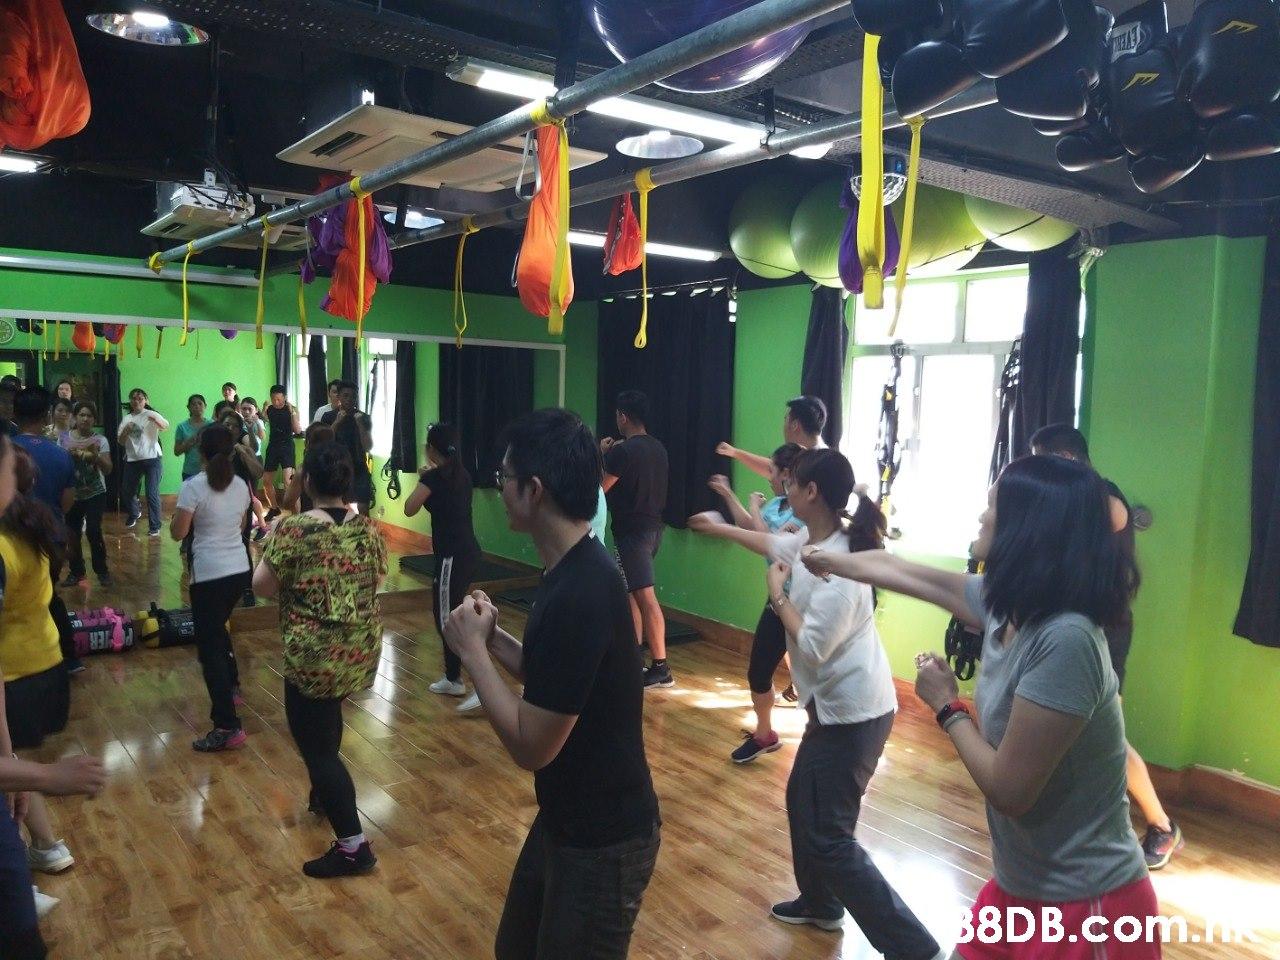 .uS-  Event,Dance,Room,Leisure,